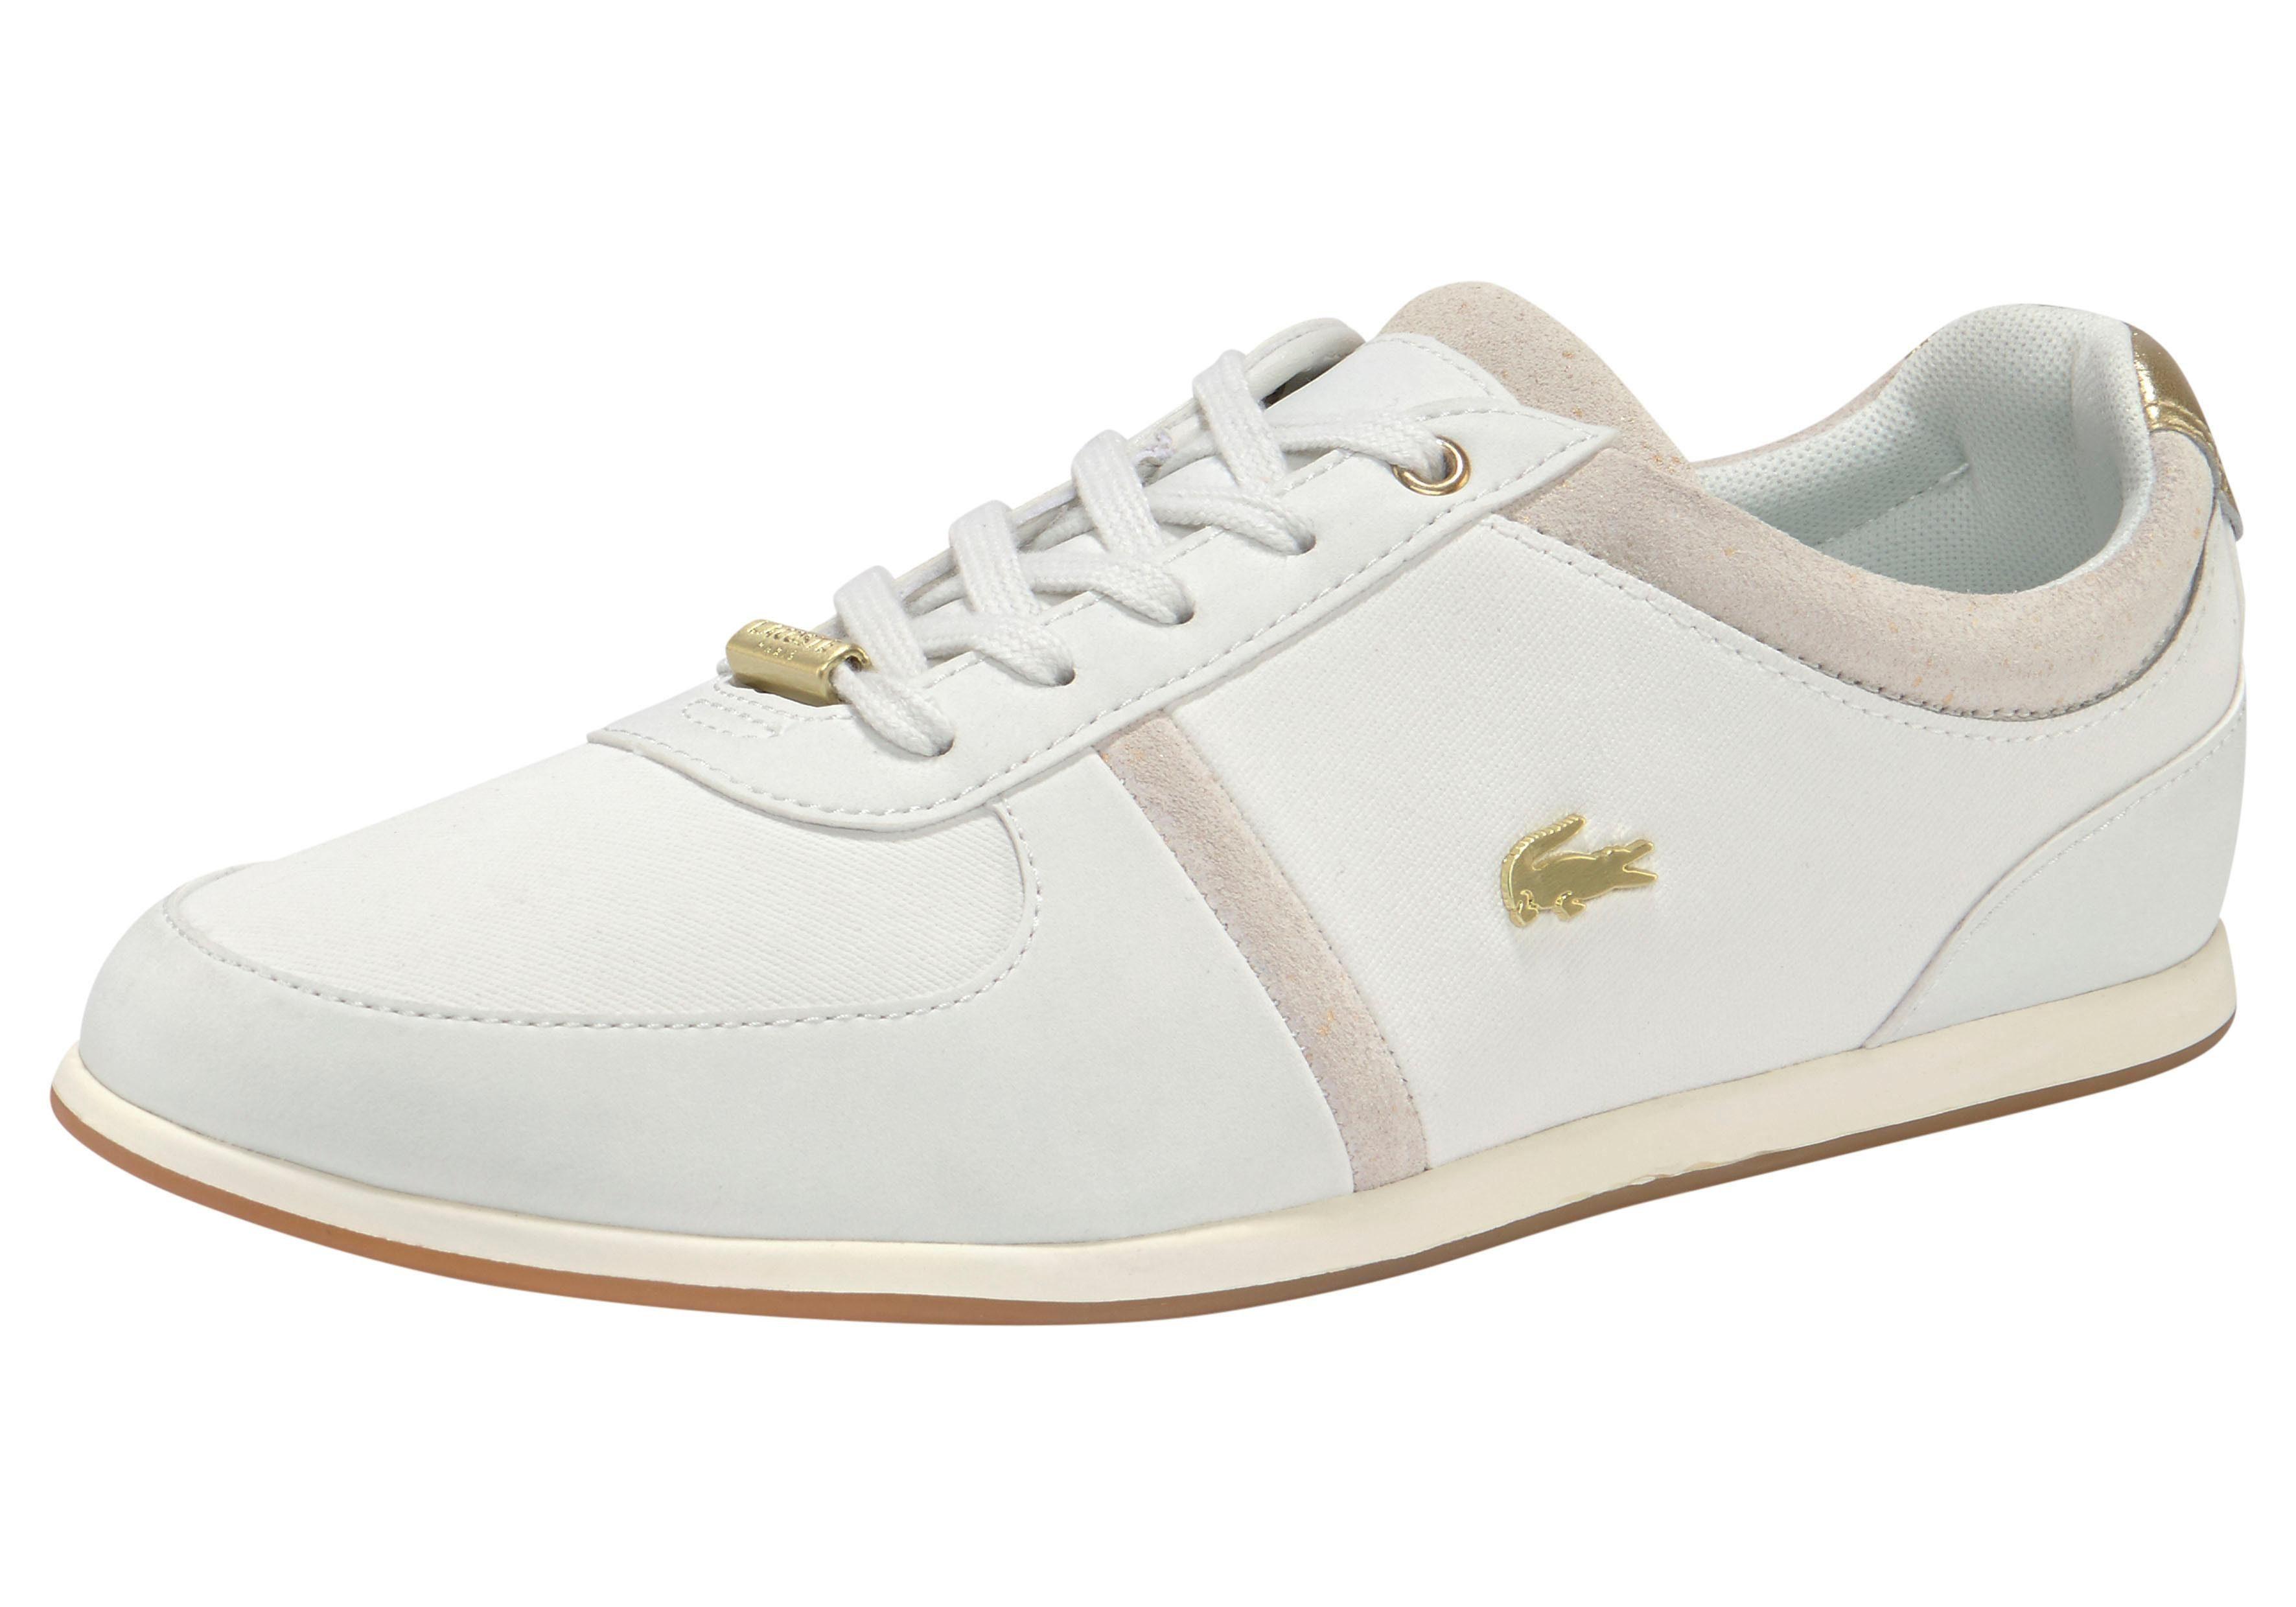 Lacoste Cfa« KaufenOtto Sport 2 »rey 119 Sneaker 35j4ARqL